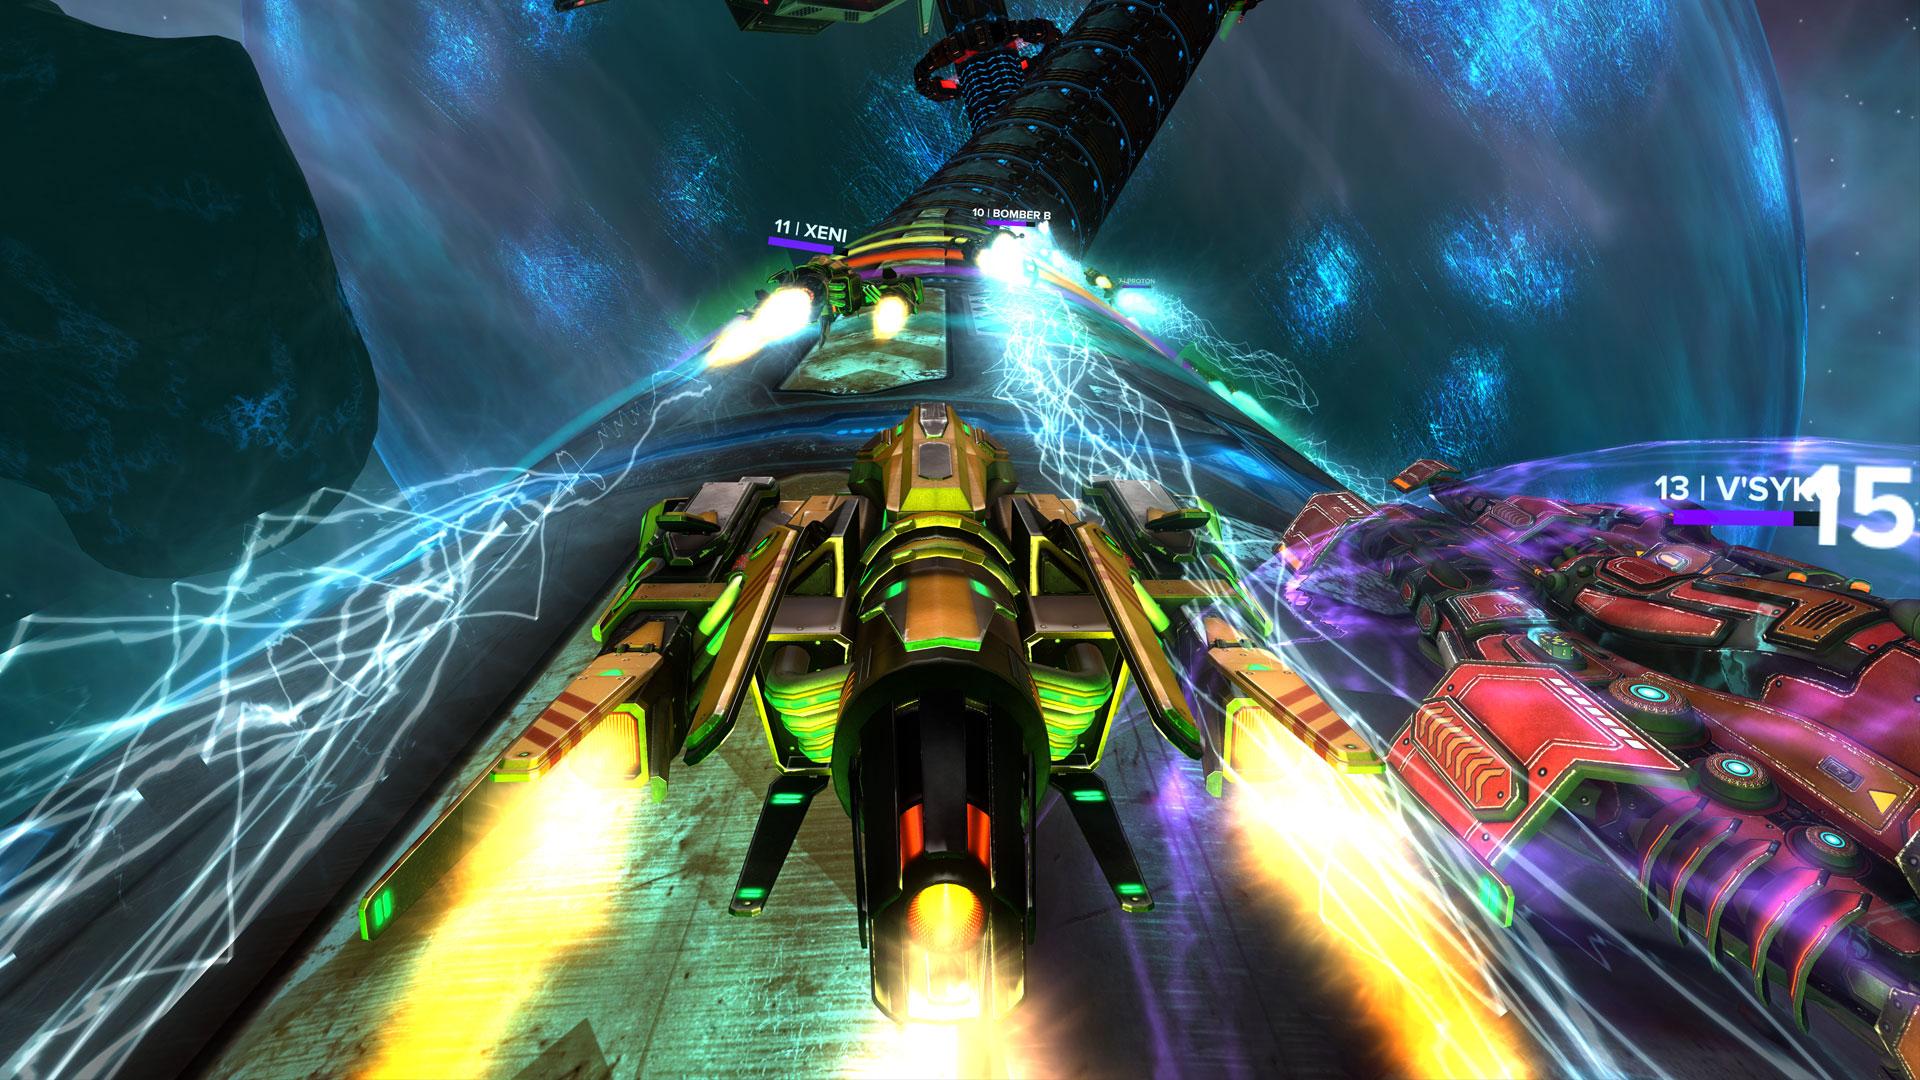 Racing screenshot in space